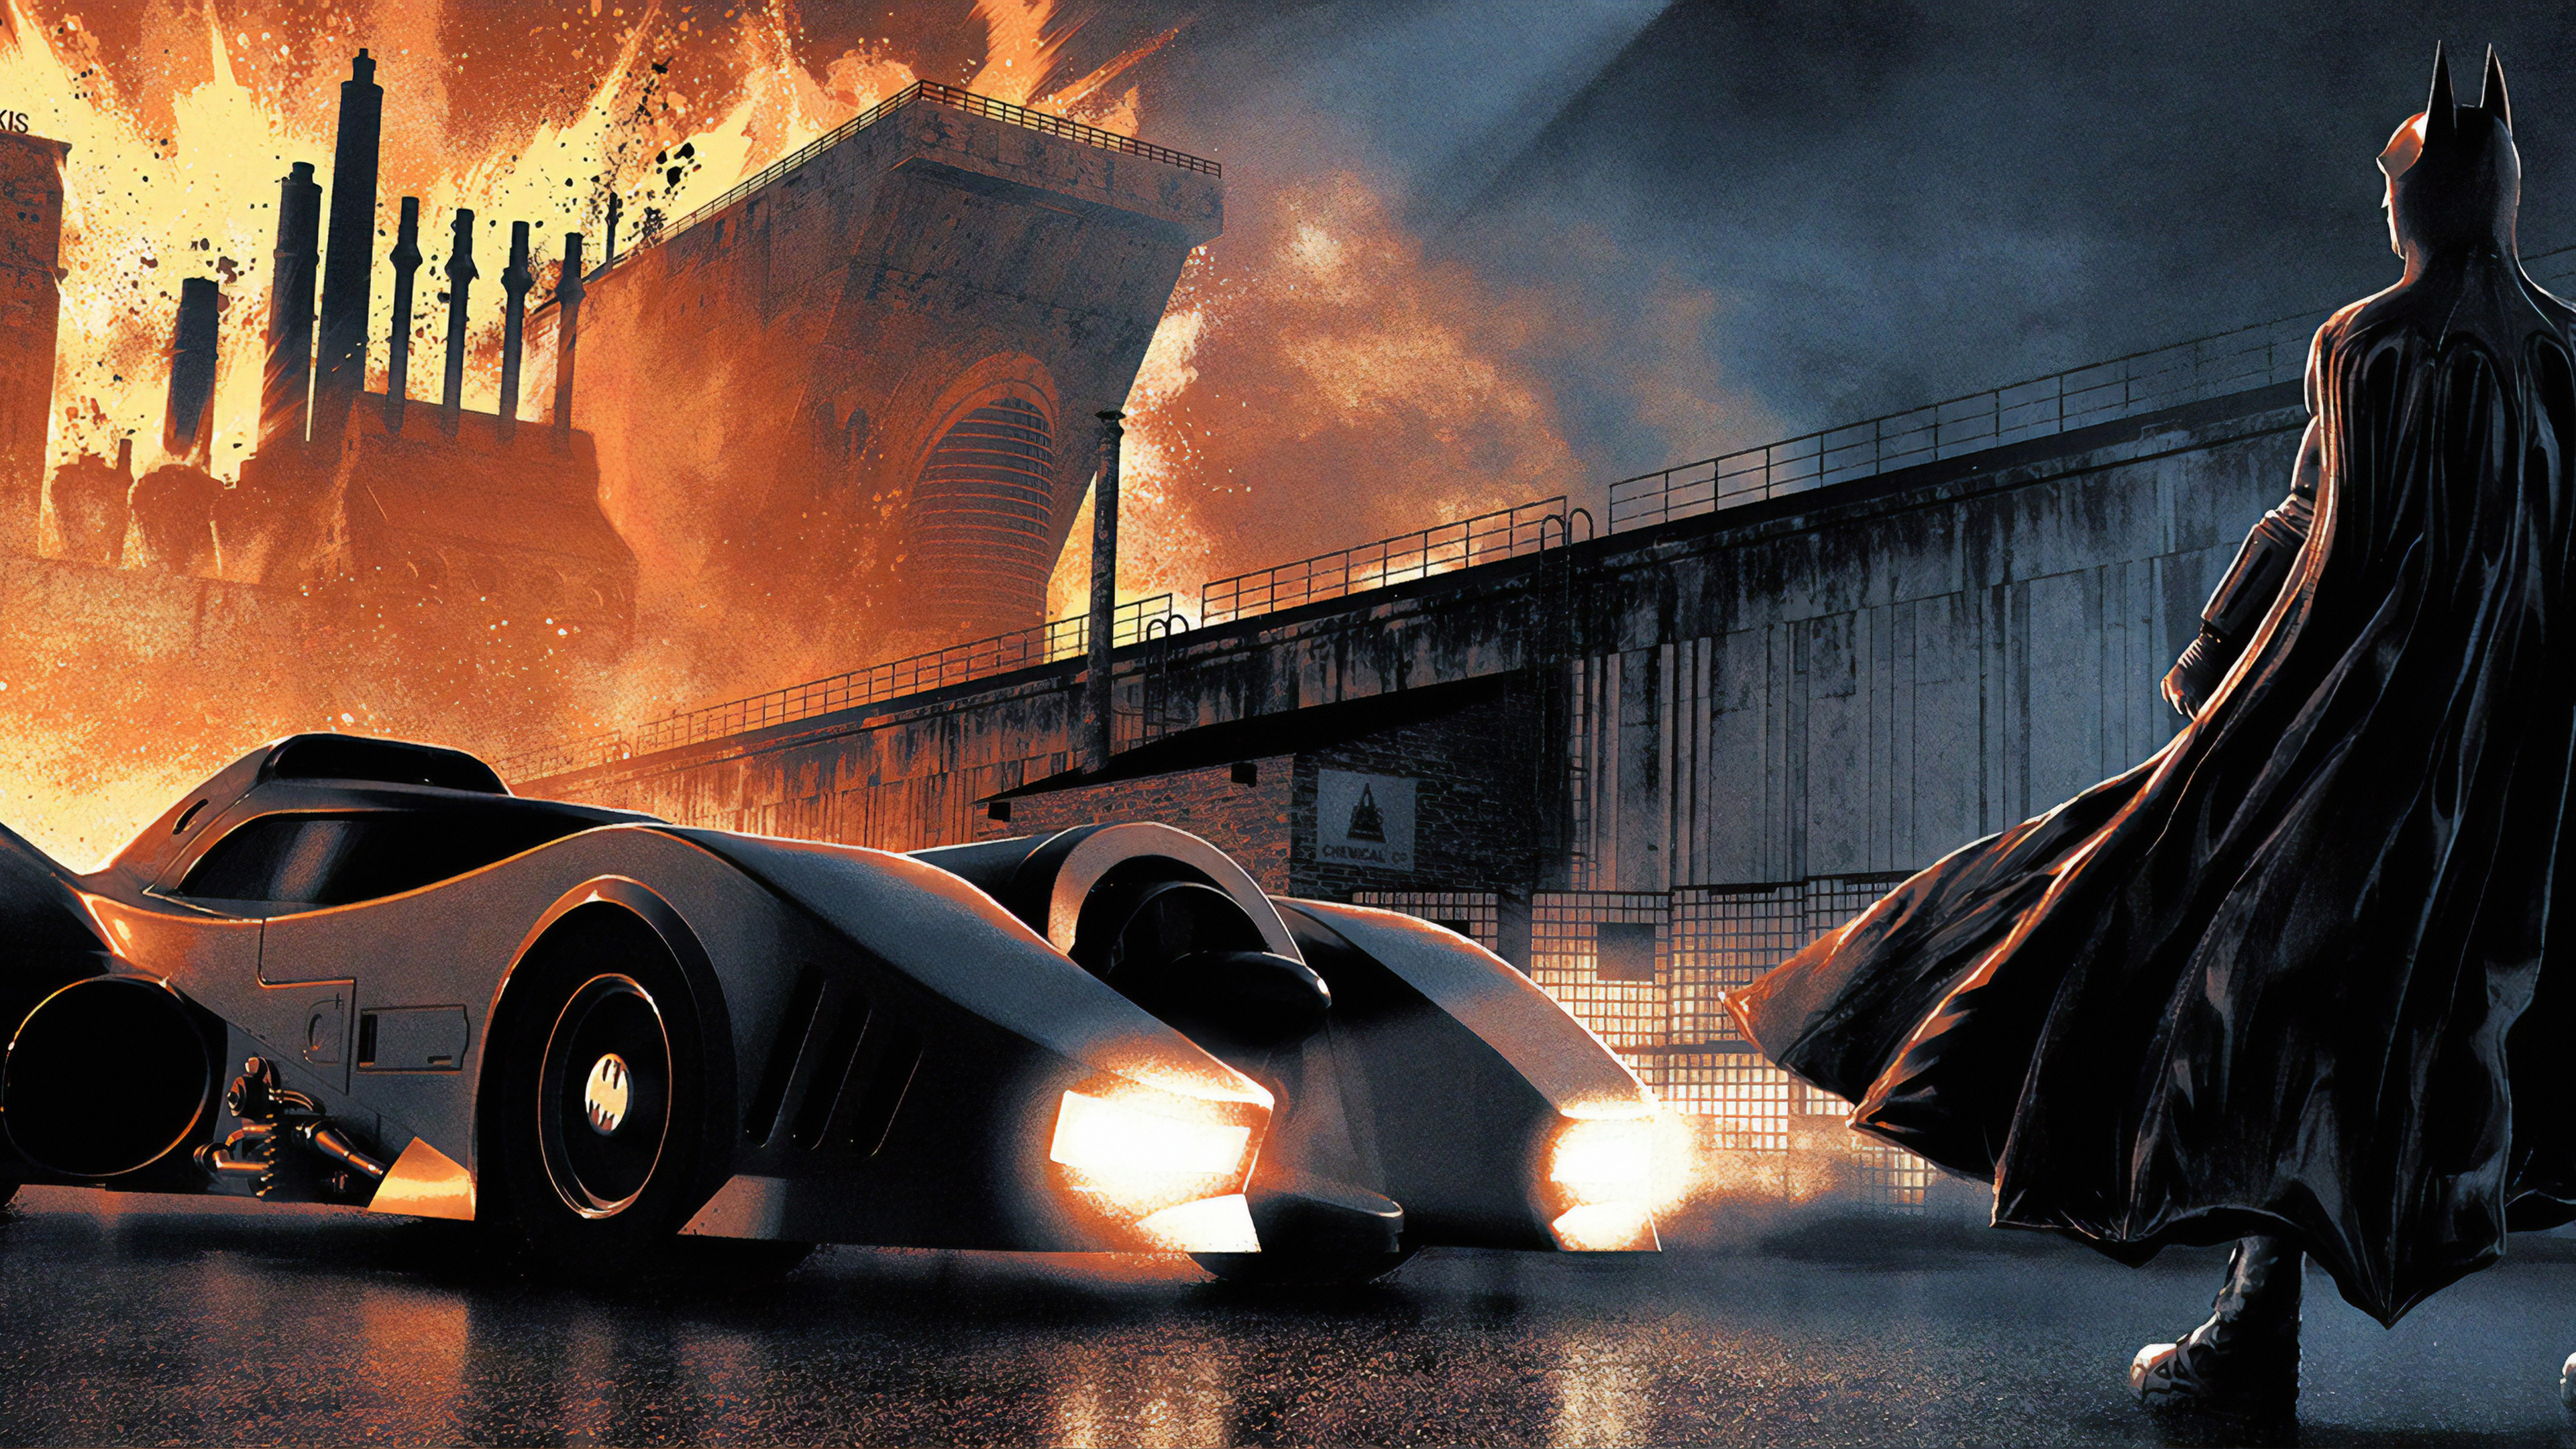 batman nad batmobile 1570918441 - Batman Nad Batmobile - superheroes wallpapers, hd-wallpapers, digital art wallpapers, batman wallpapers, artwork wallpapers, 4k-wallpapers